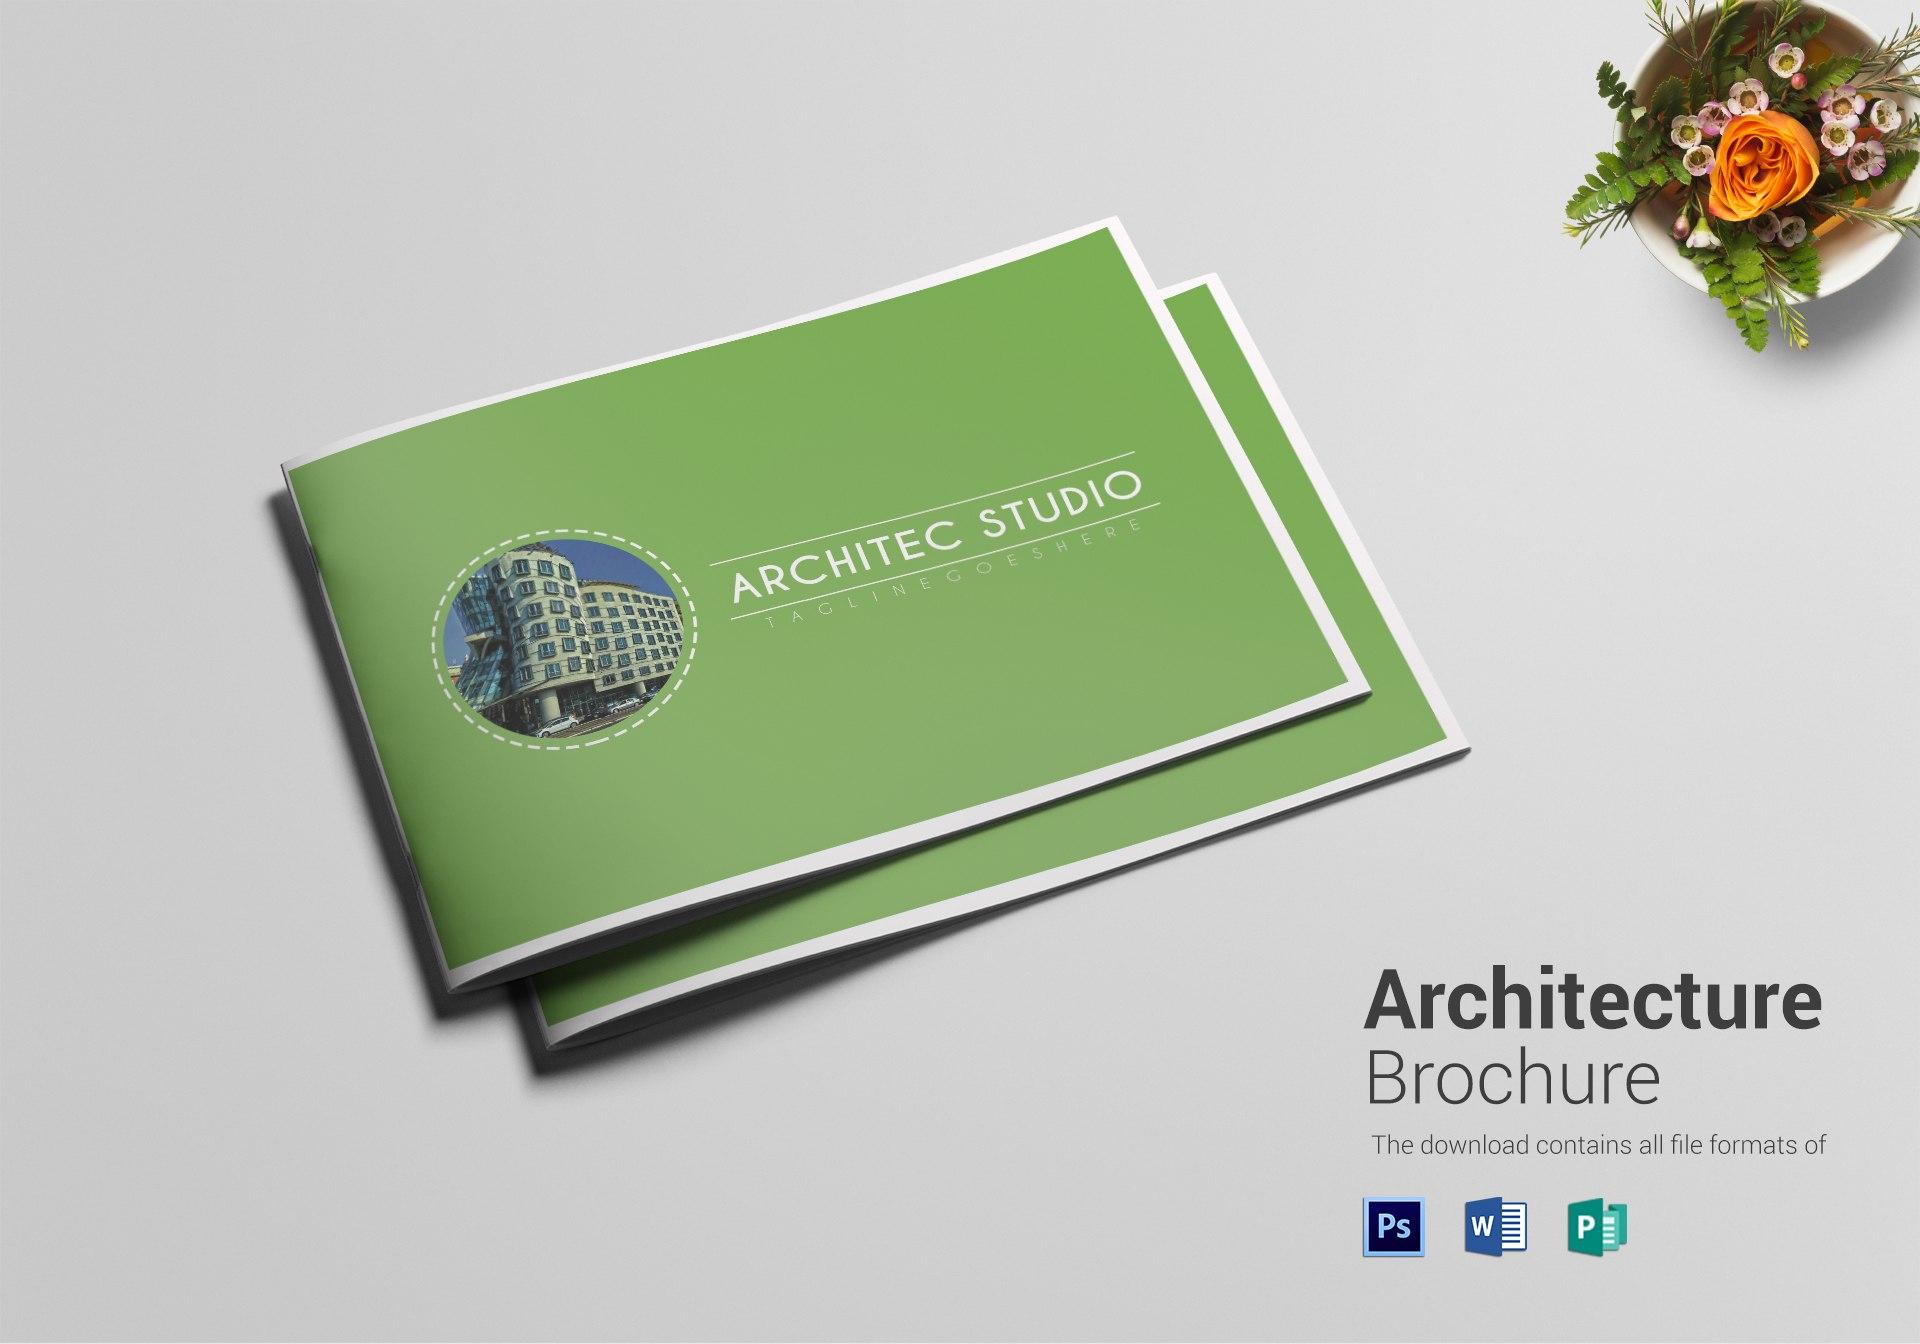 Modern Architecture Brochure Design Template In Psd Word Publisher For Architecture Brochure Templates Free Download